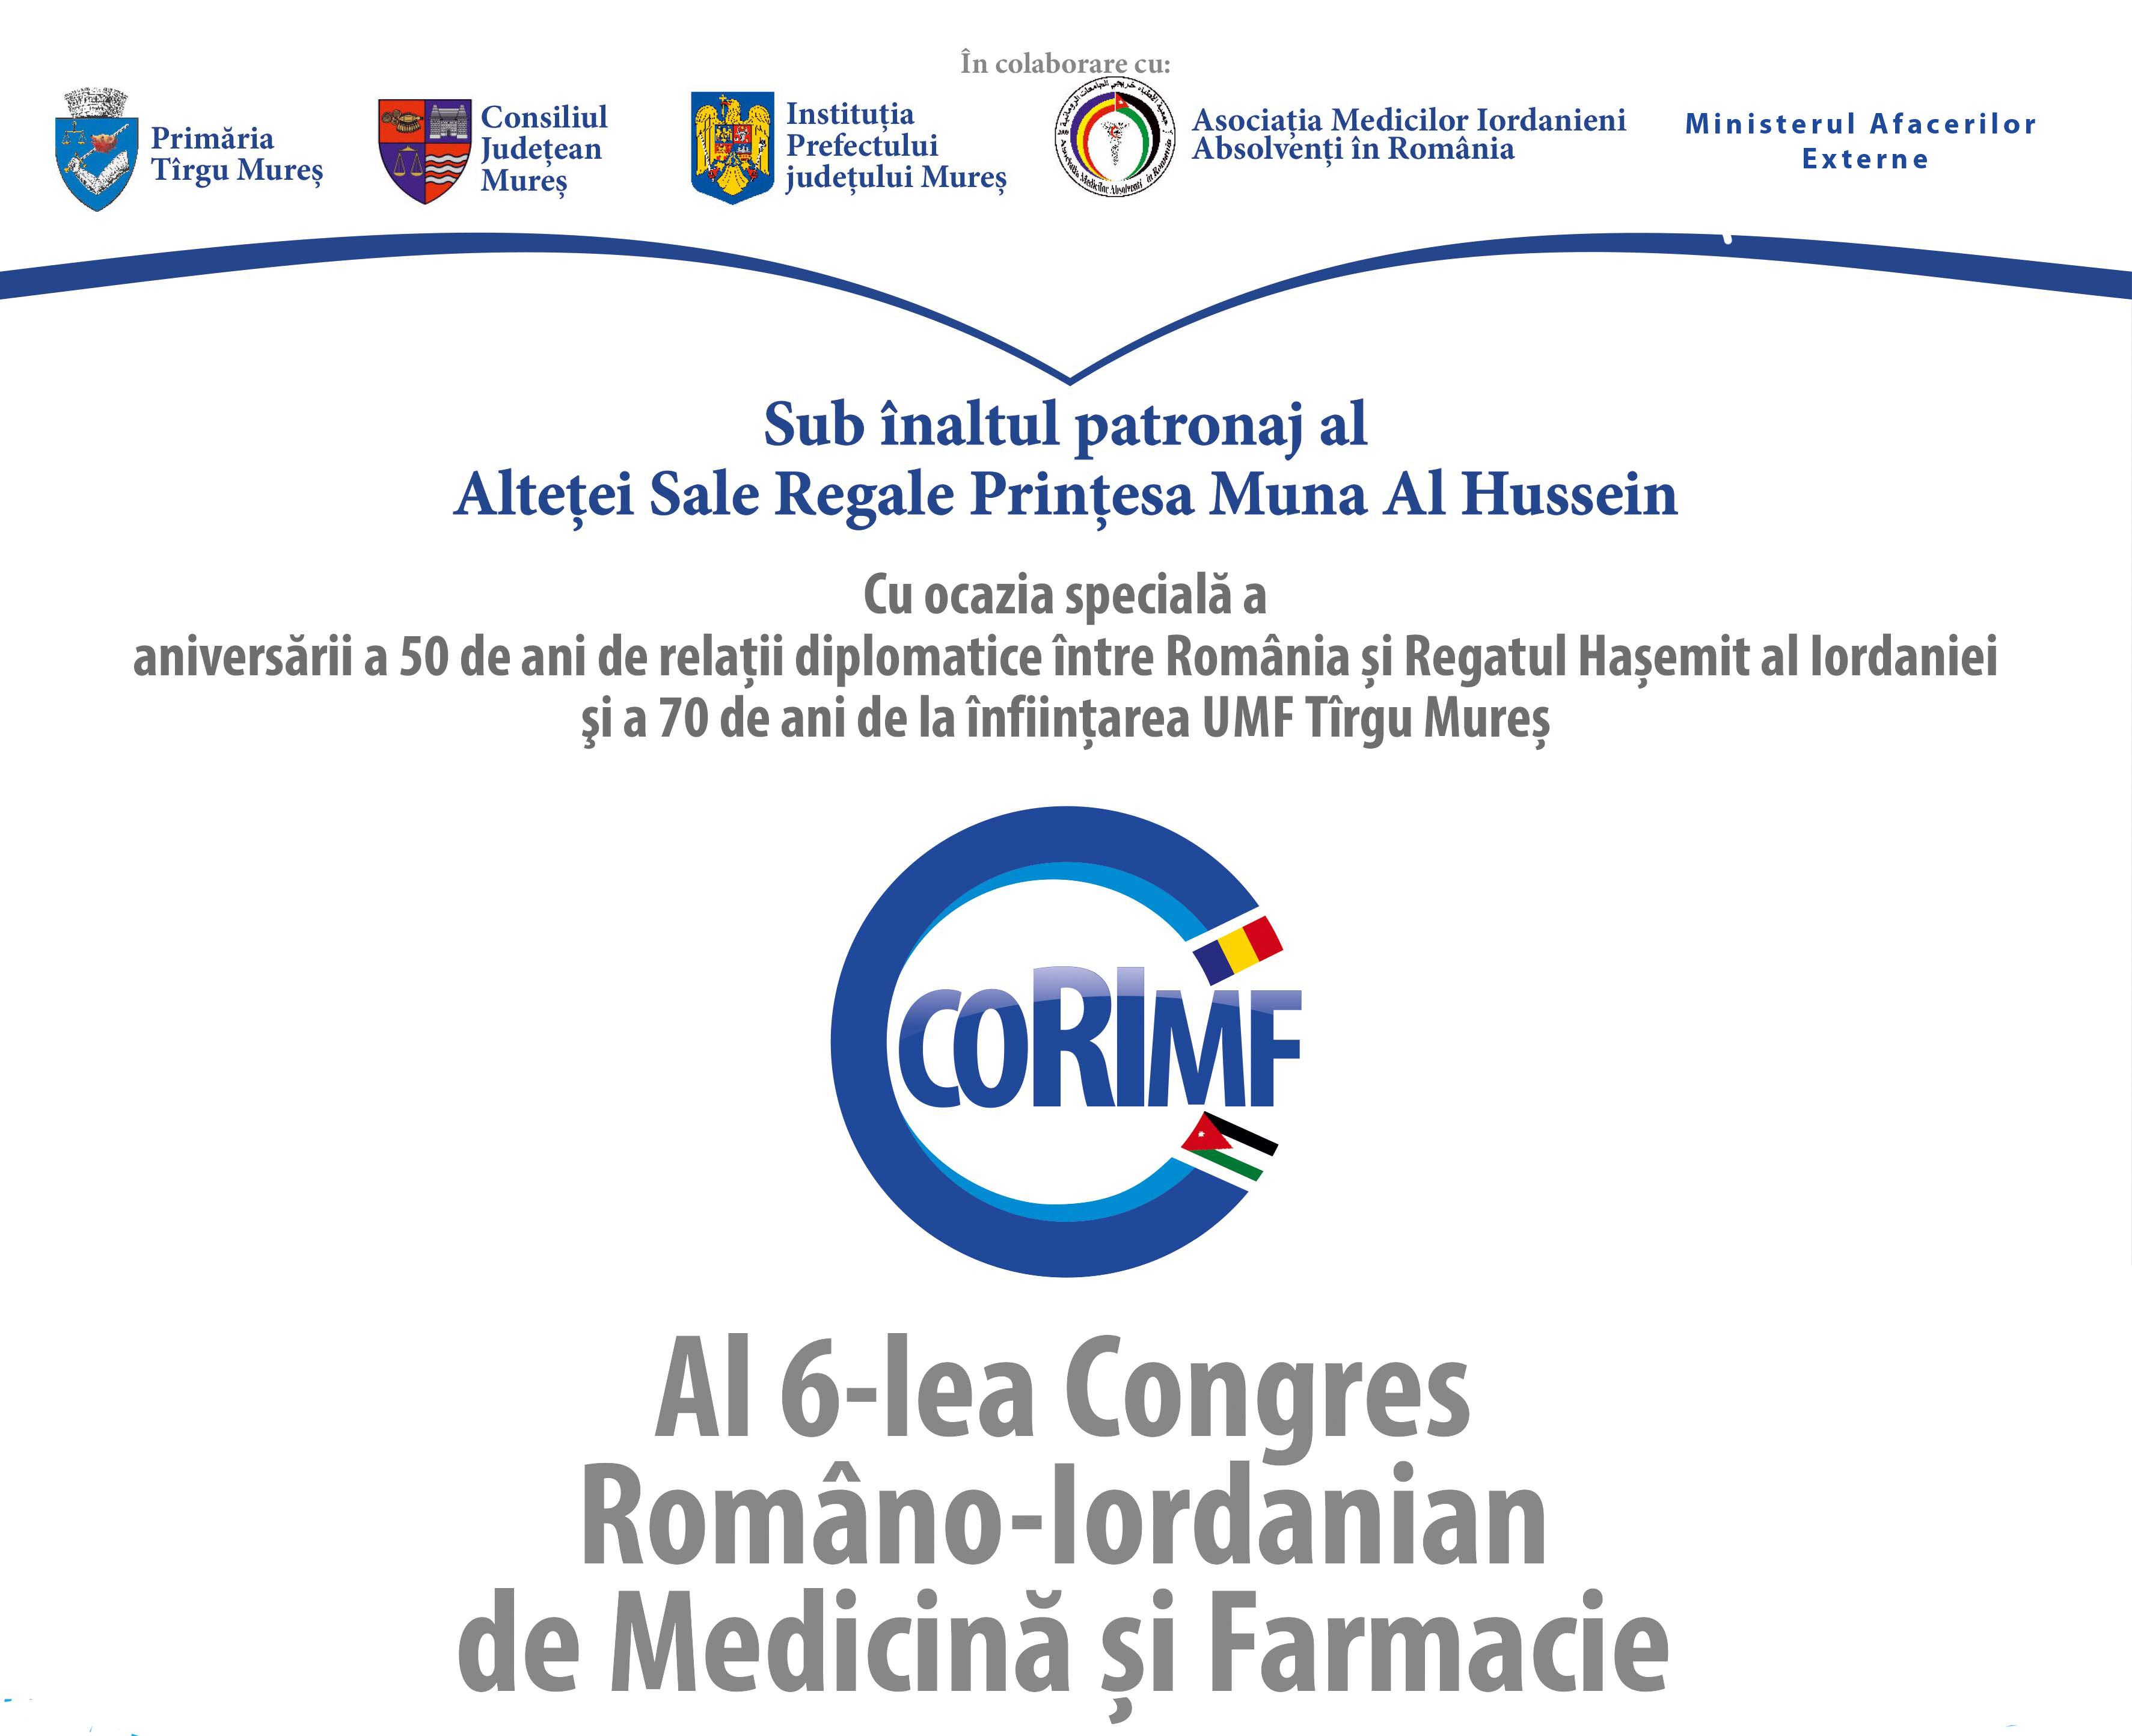 Congresul Româno-Iordanian de Medicina si Farmacie